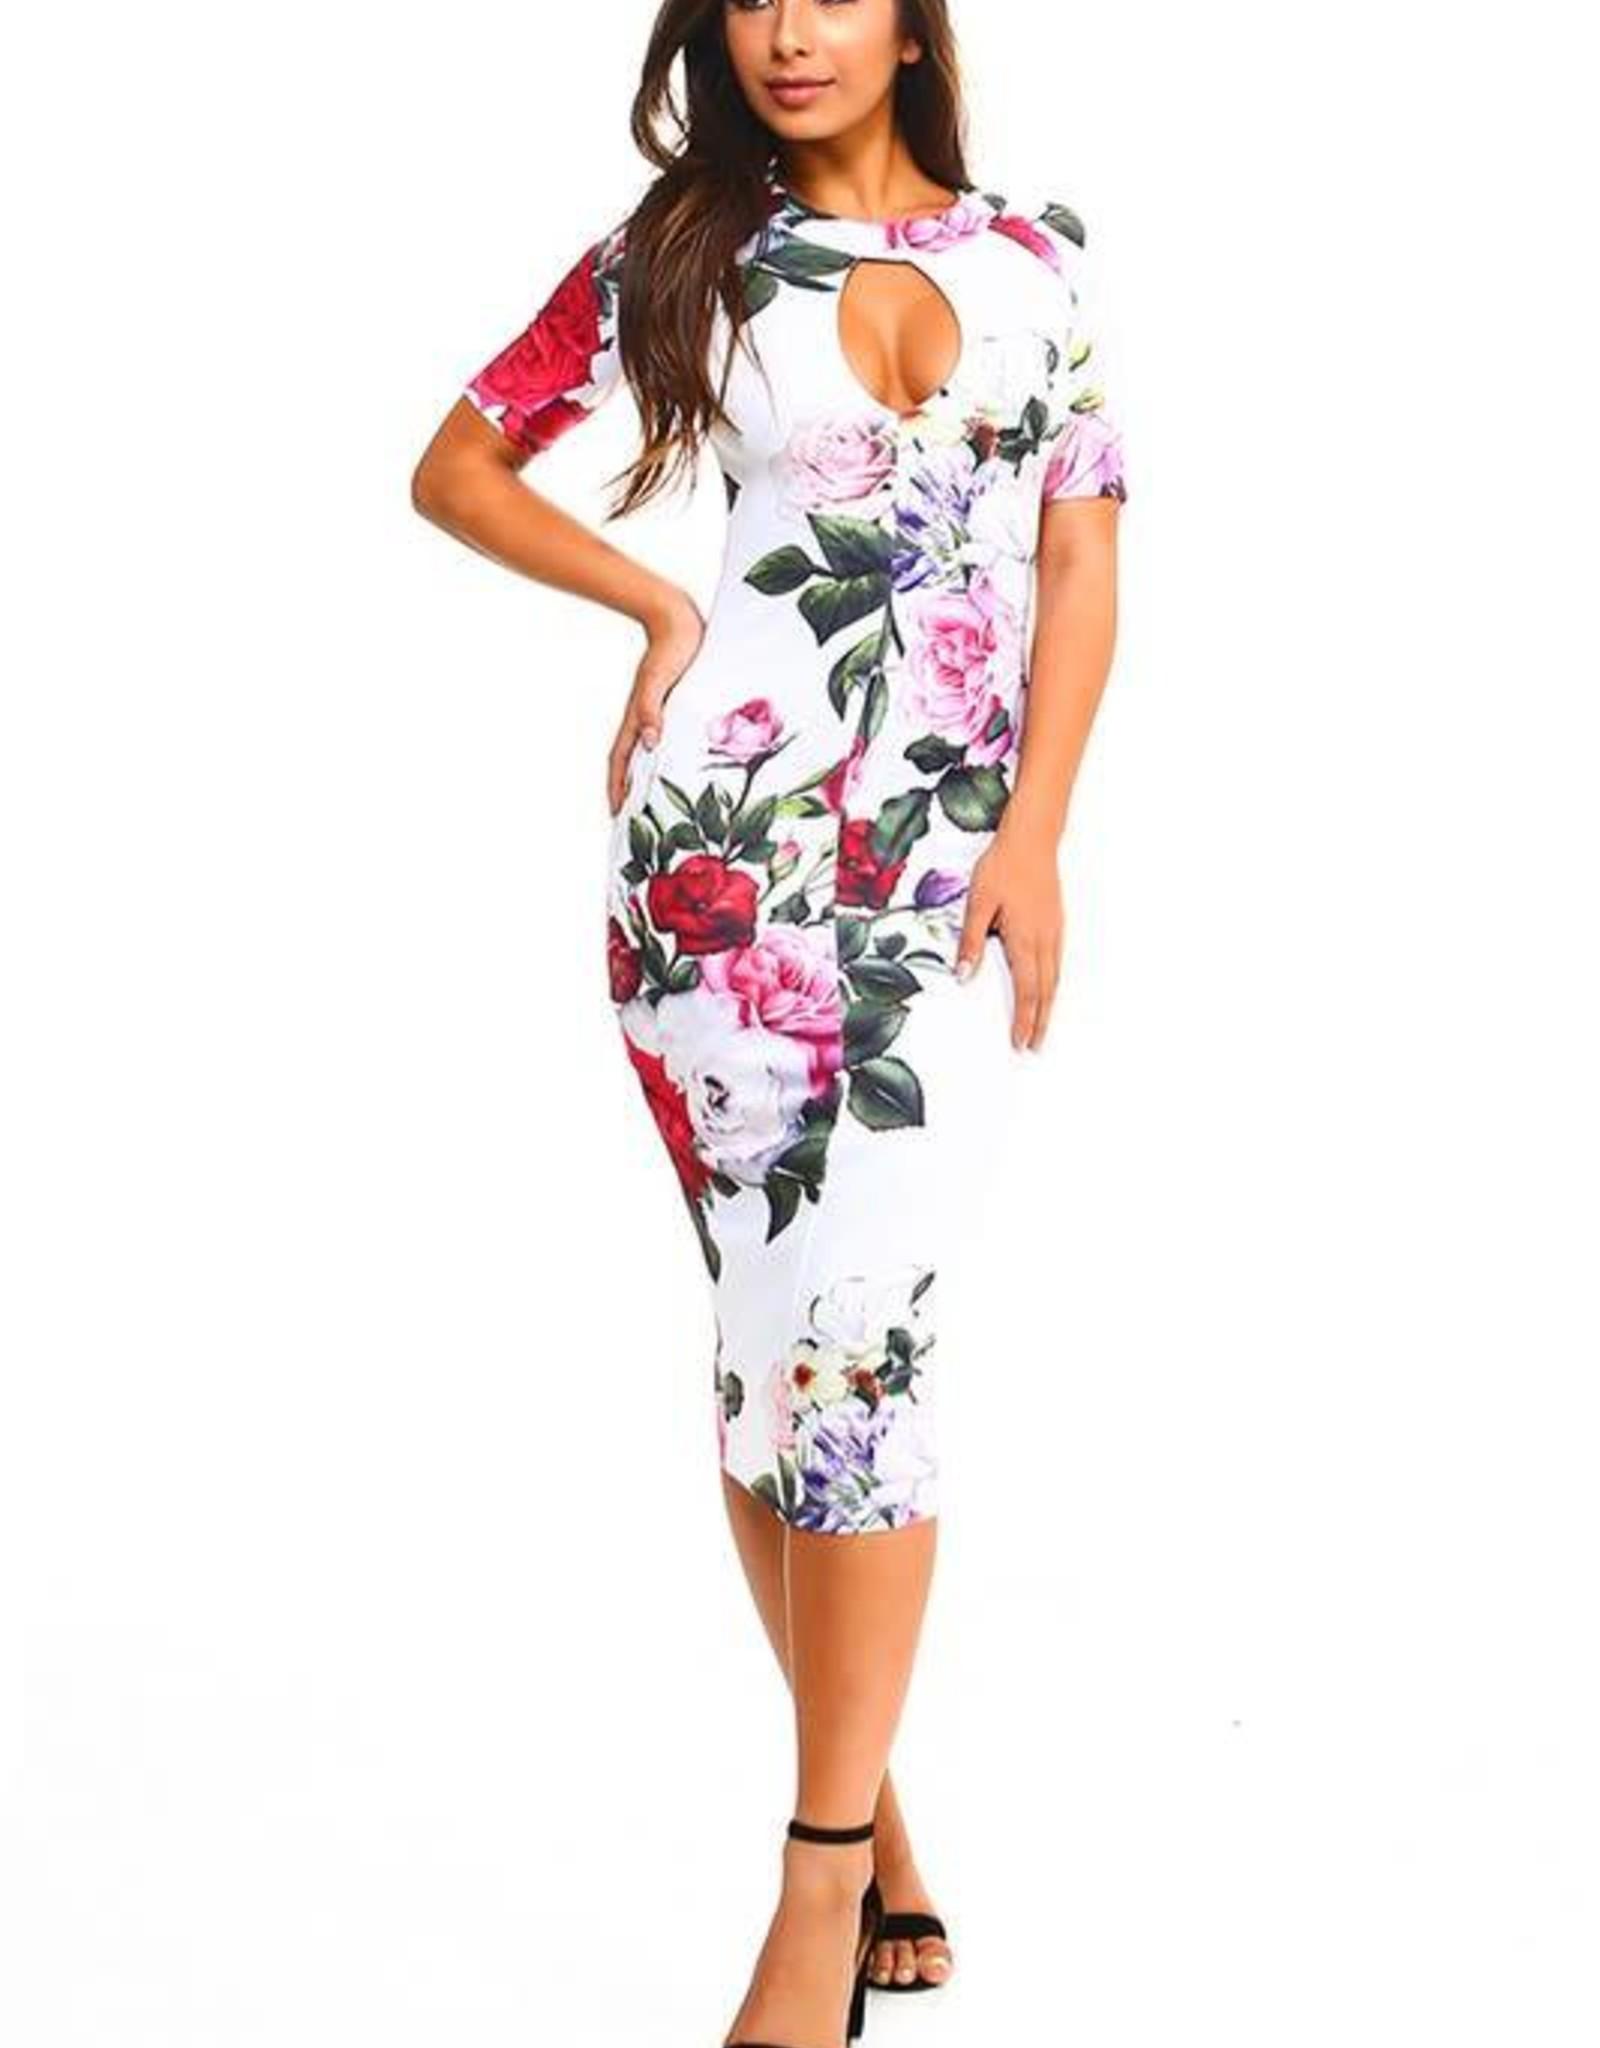 Blushing Geisha Dress